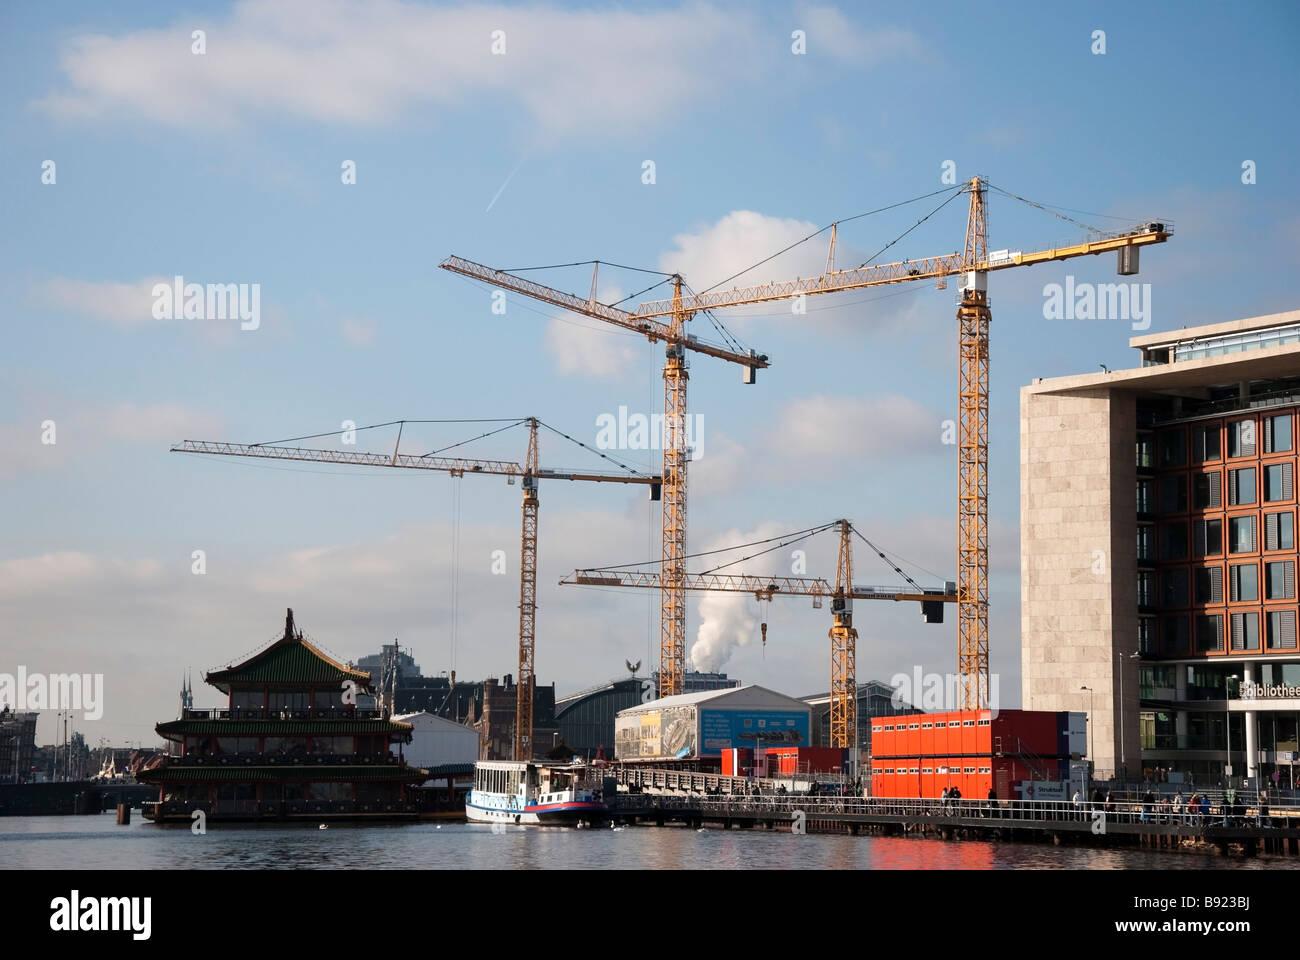 North/South Metroline Construction Amsterdam - Stock Image